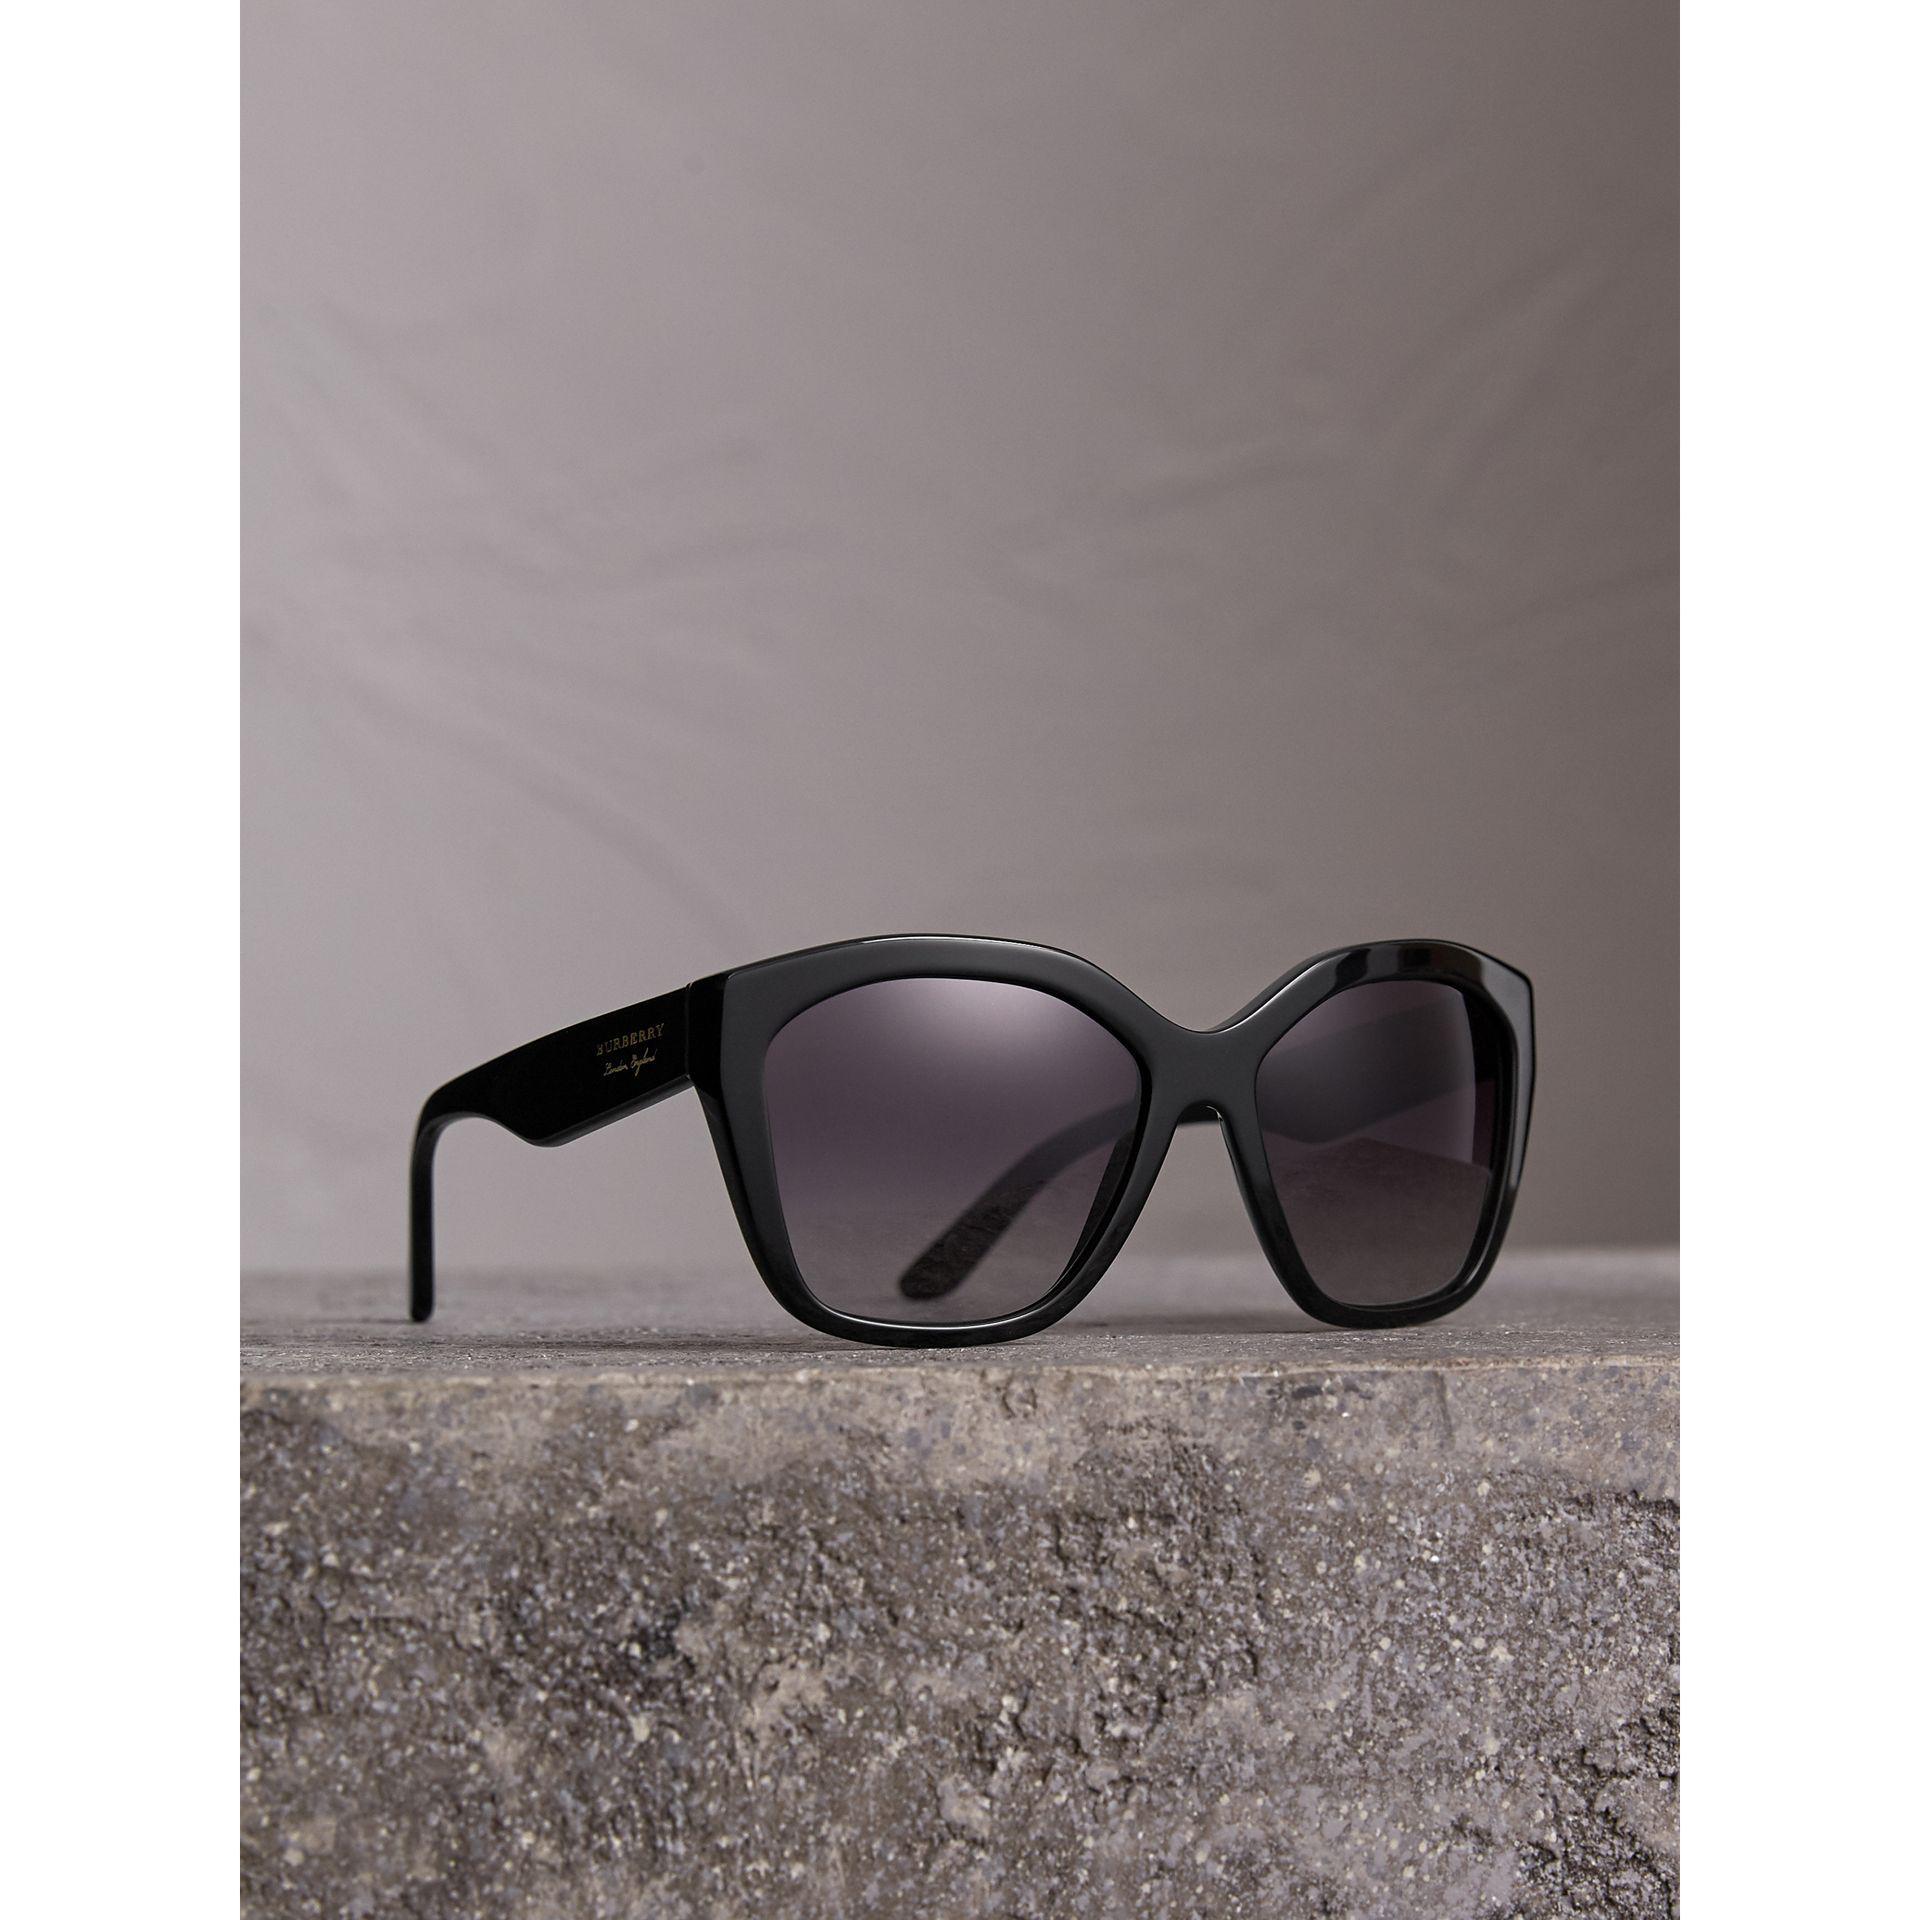 951509afac02 Burberry - Black Square Frame Sunglasses - Lyst. View fullscreen